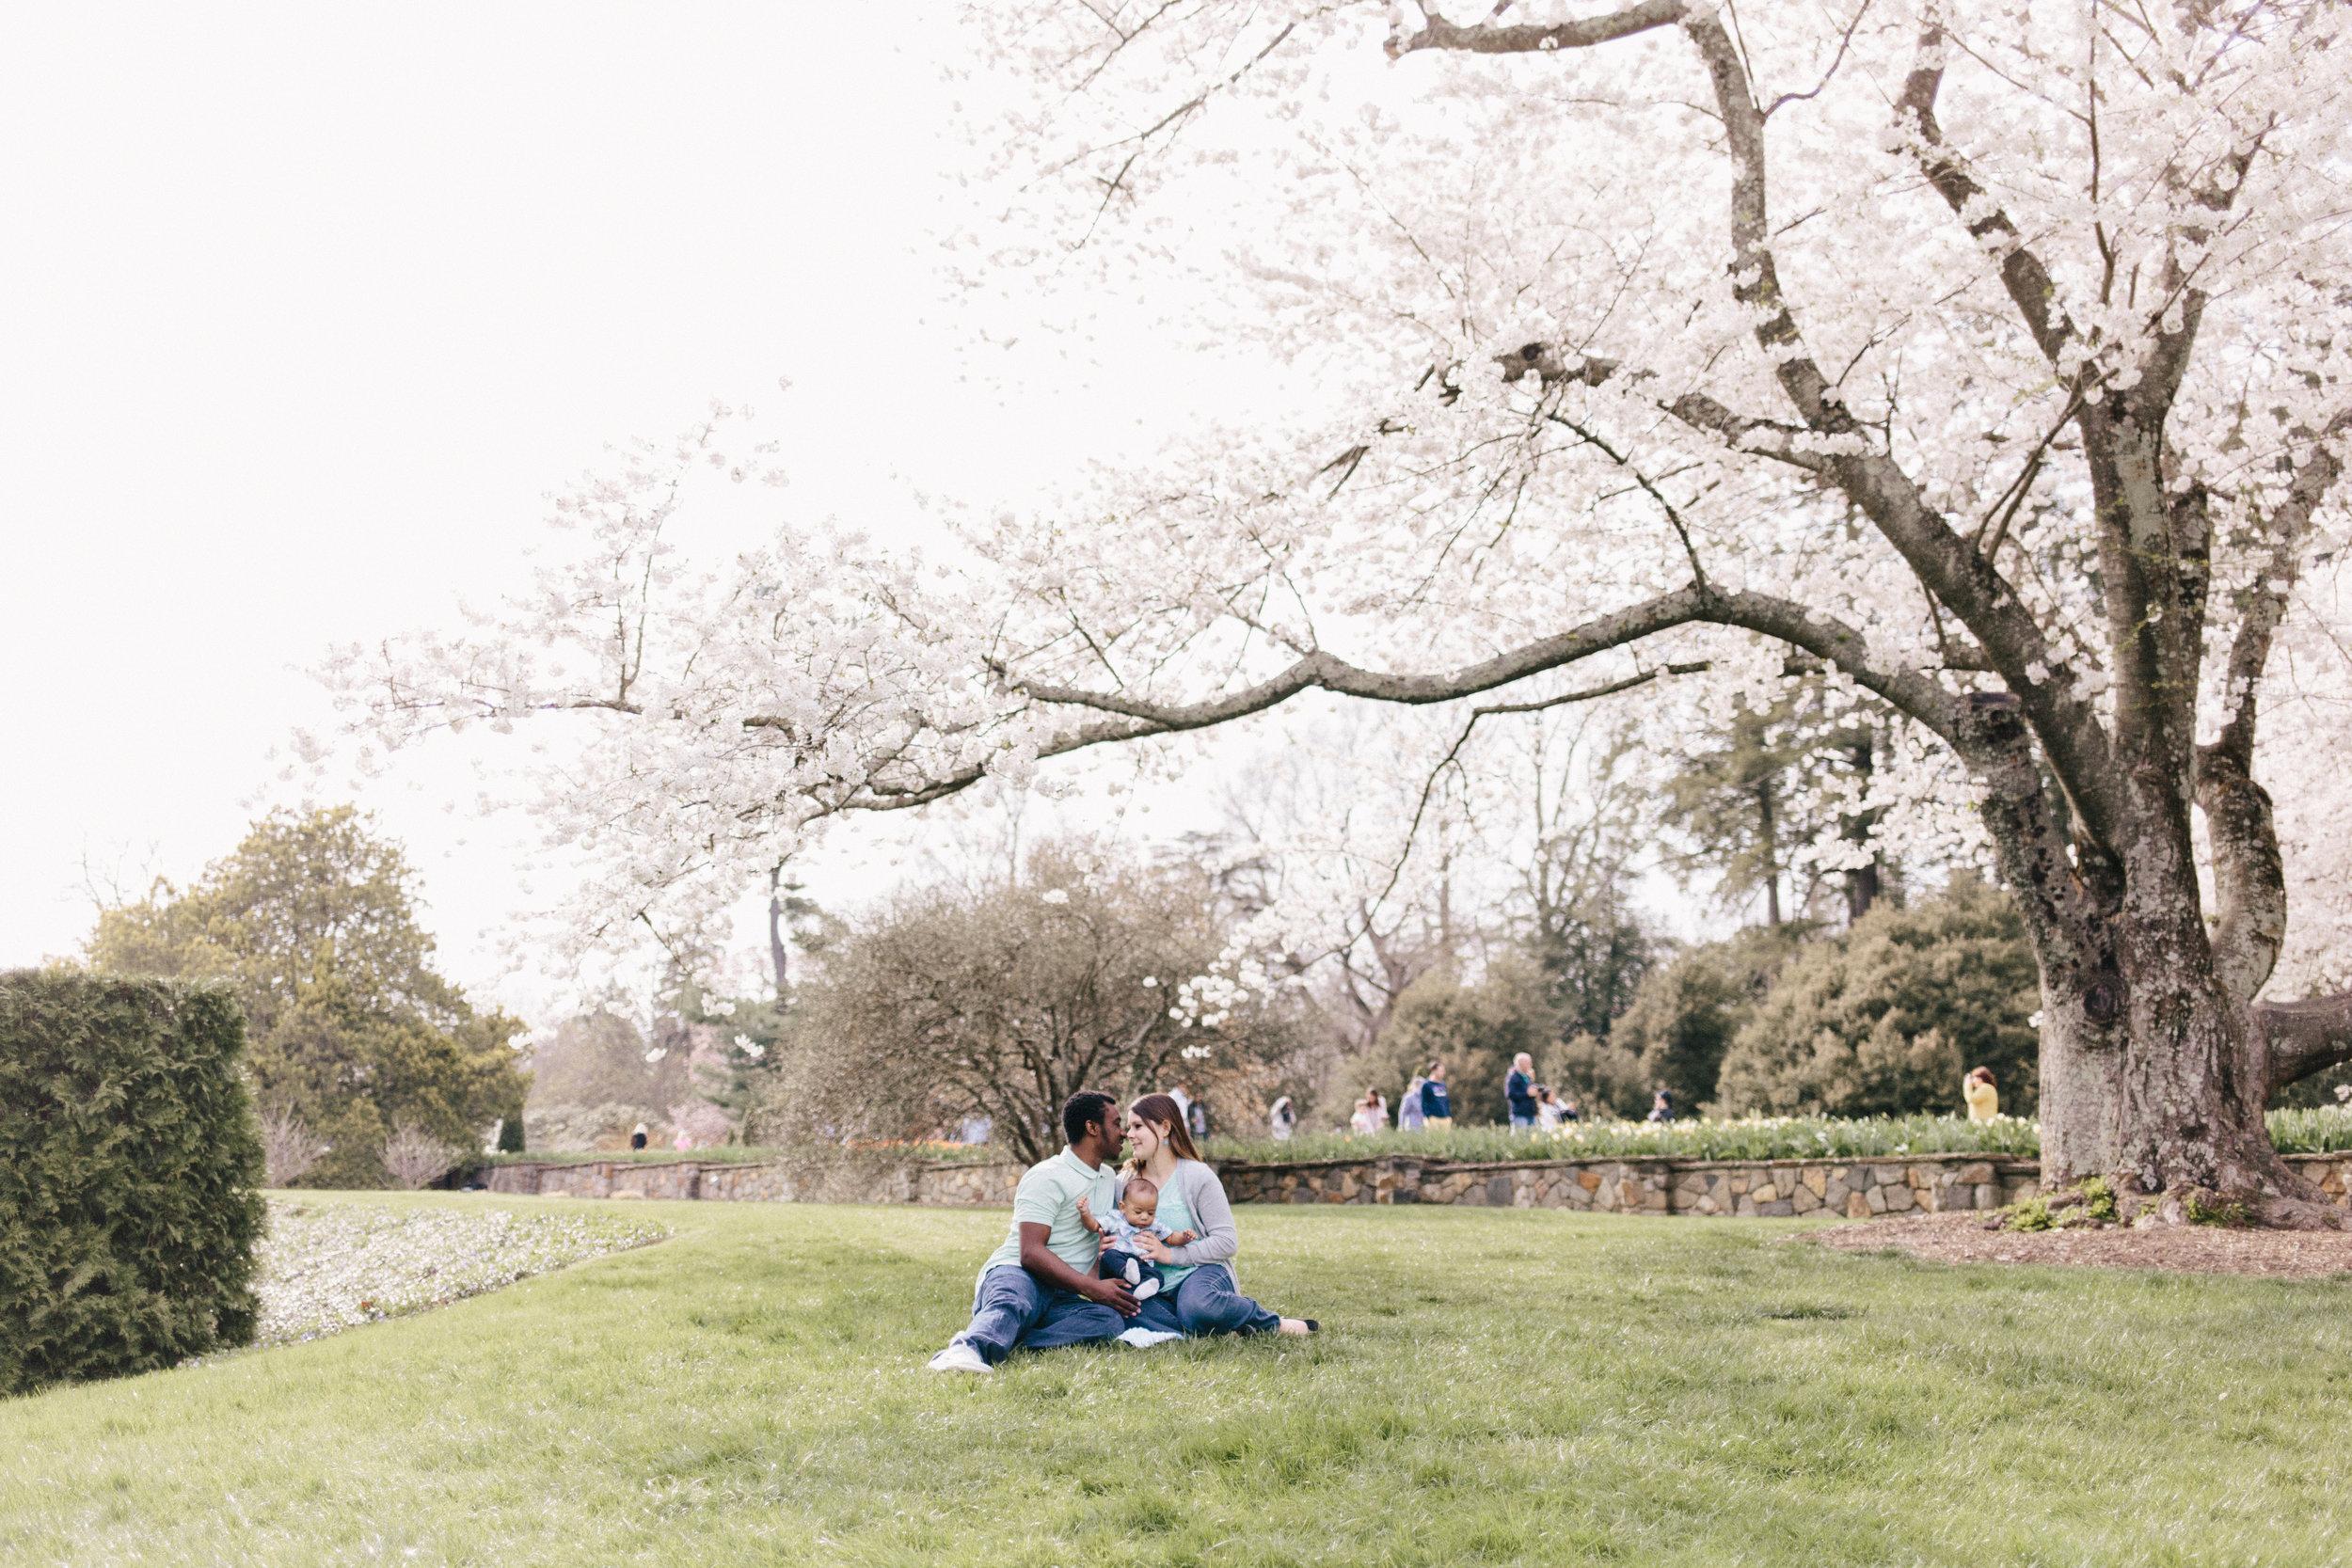 saundra_megan_photography_longwood_gardens_respes_family-3.jpg